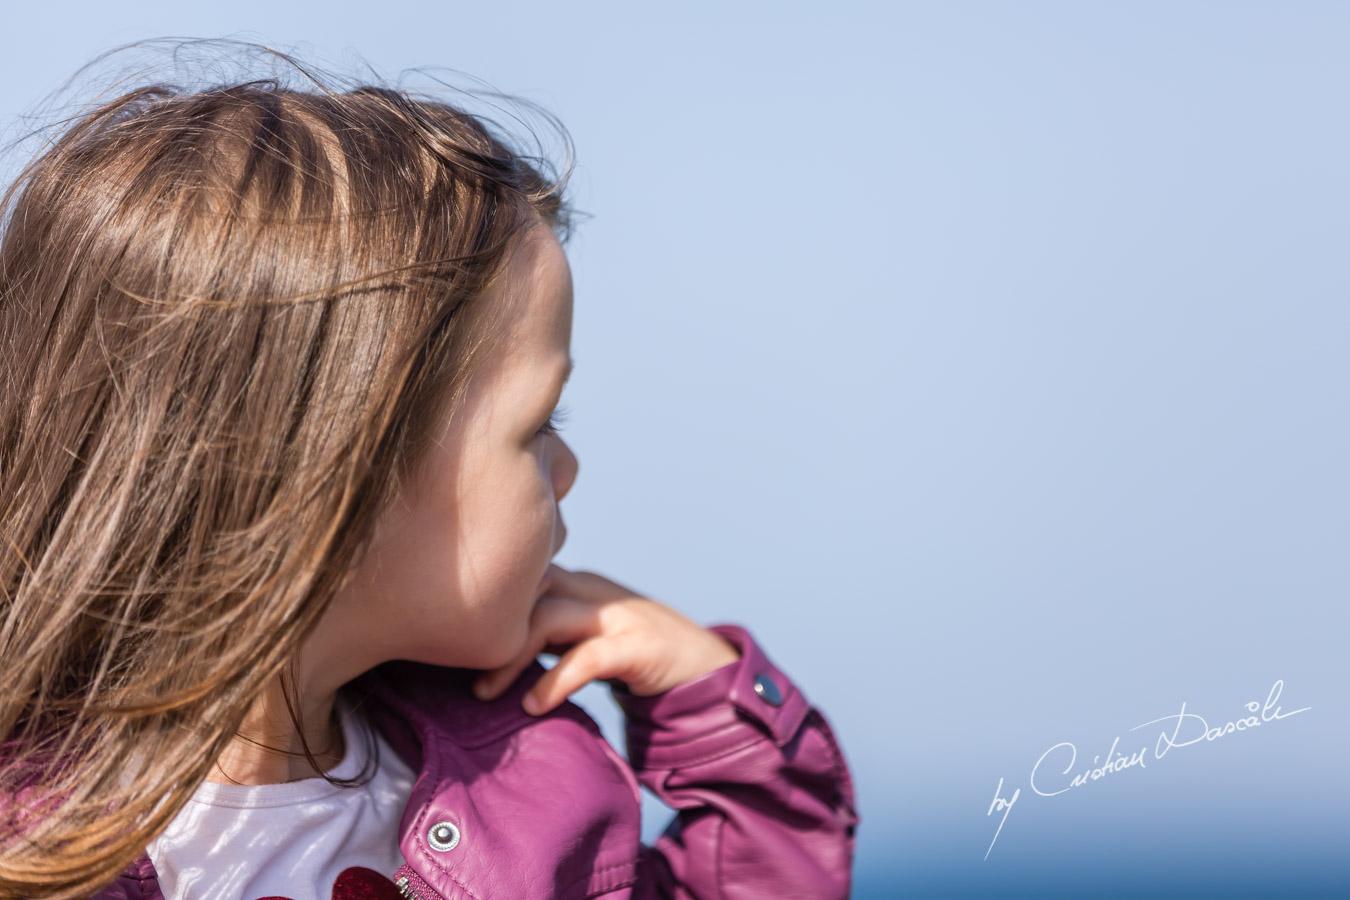 A Family Photo Shoot in Protaras, Cyprus - 07